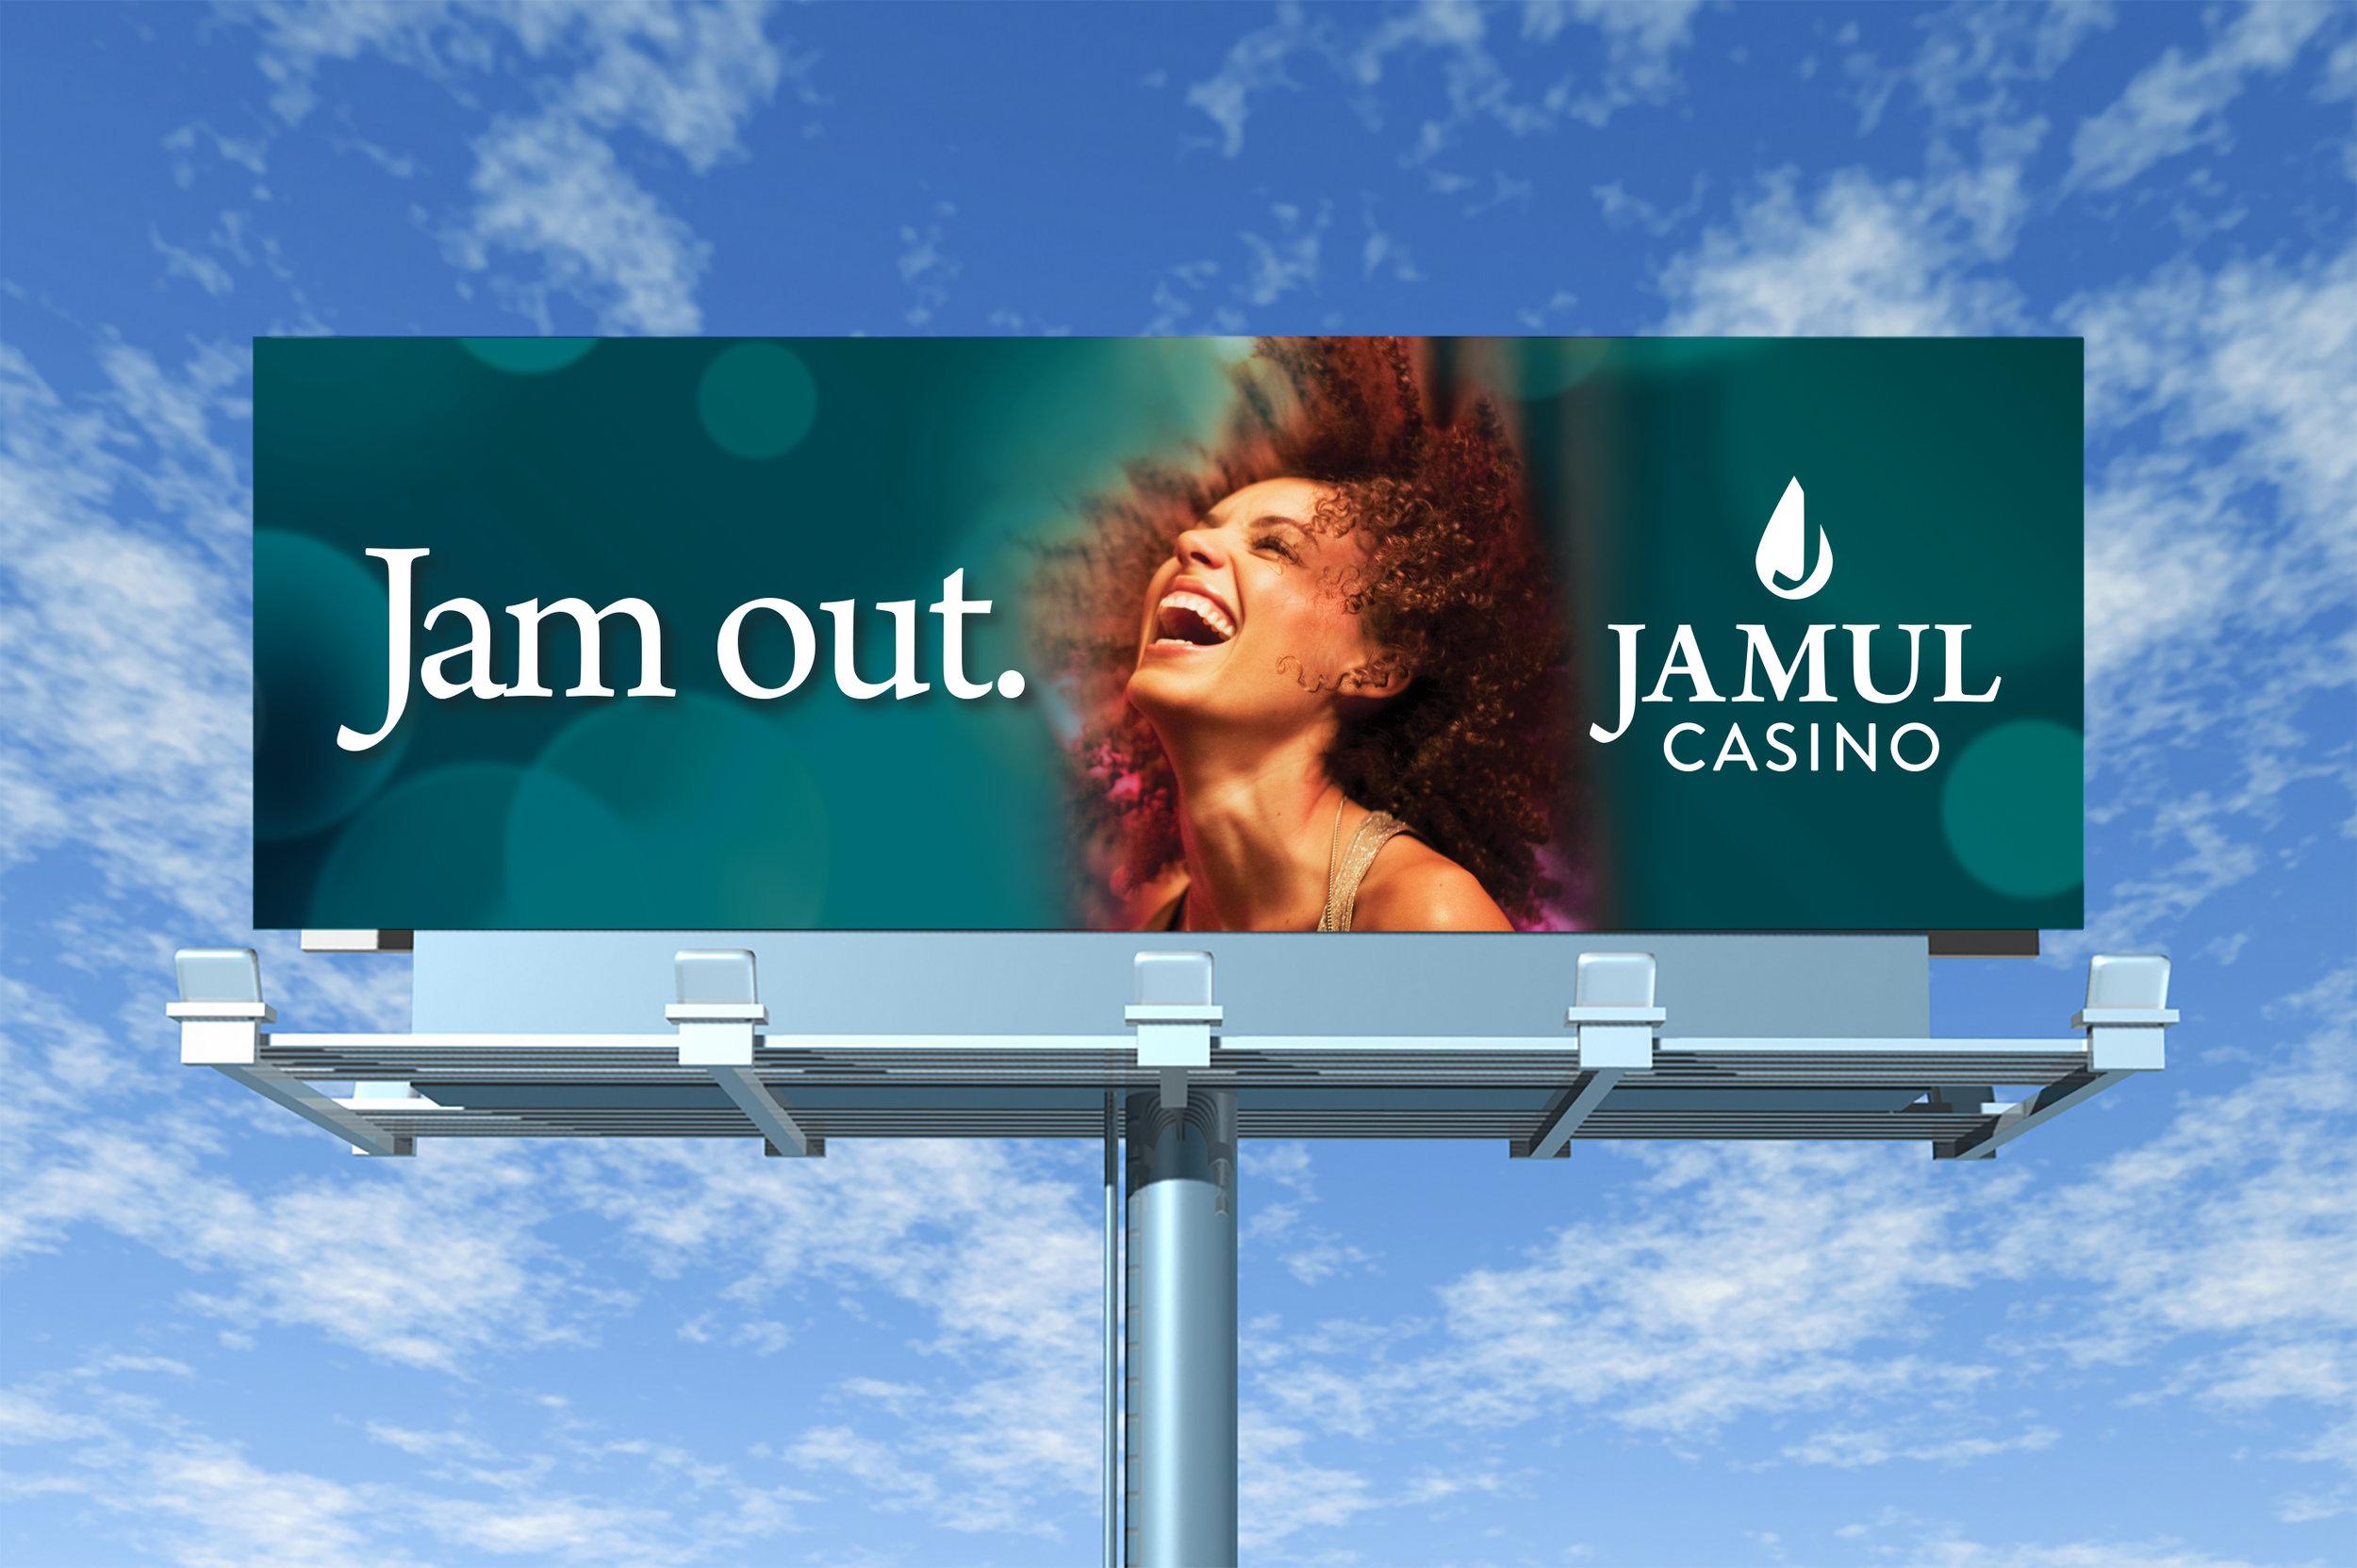 Jamul_Jam Out.jpg